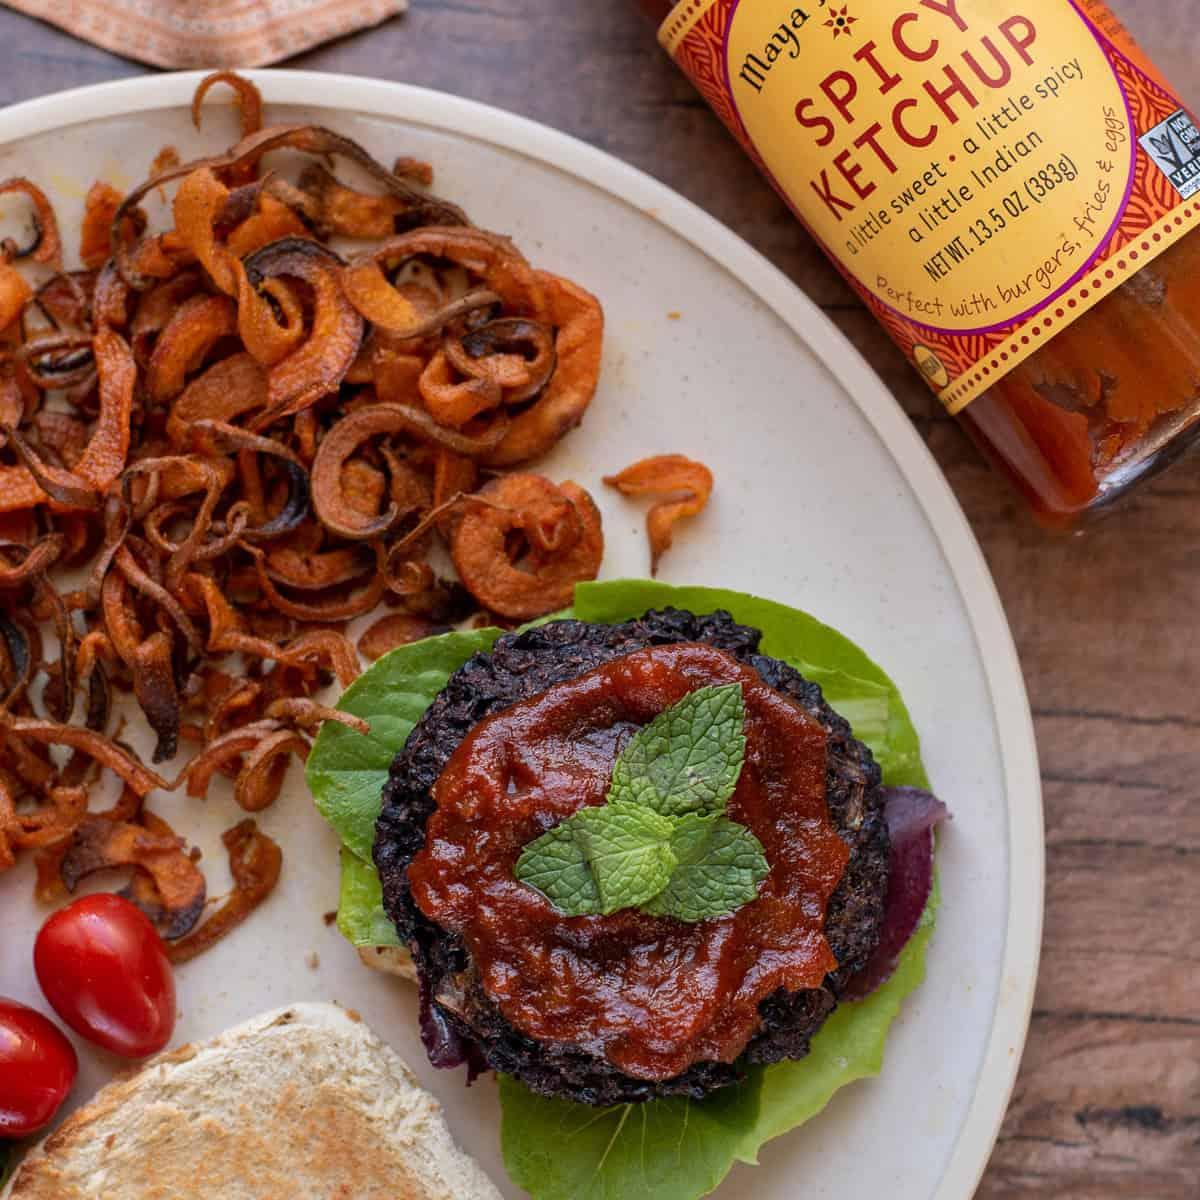 Black Lentil Veggie Burger Recipe with Baked Sweet Potato Fries